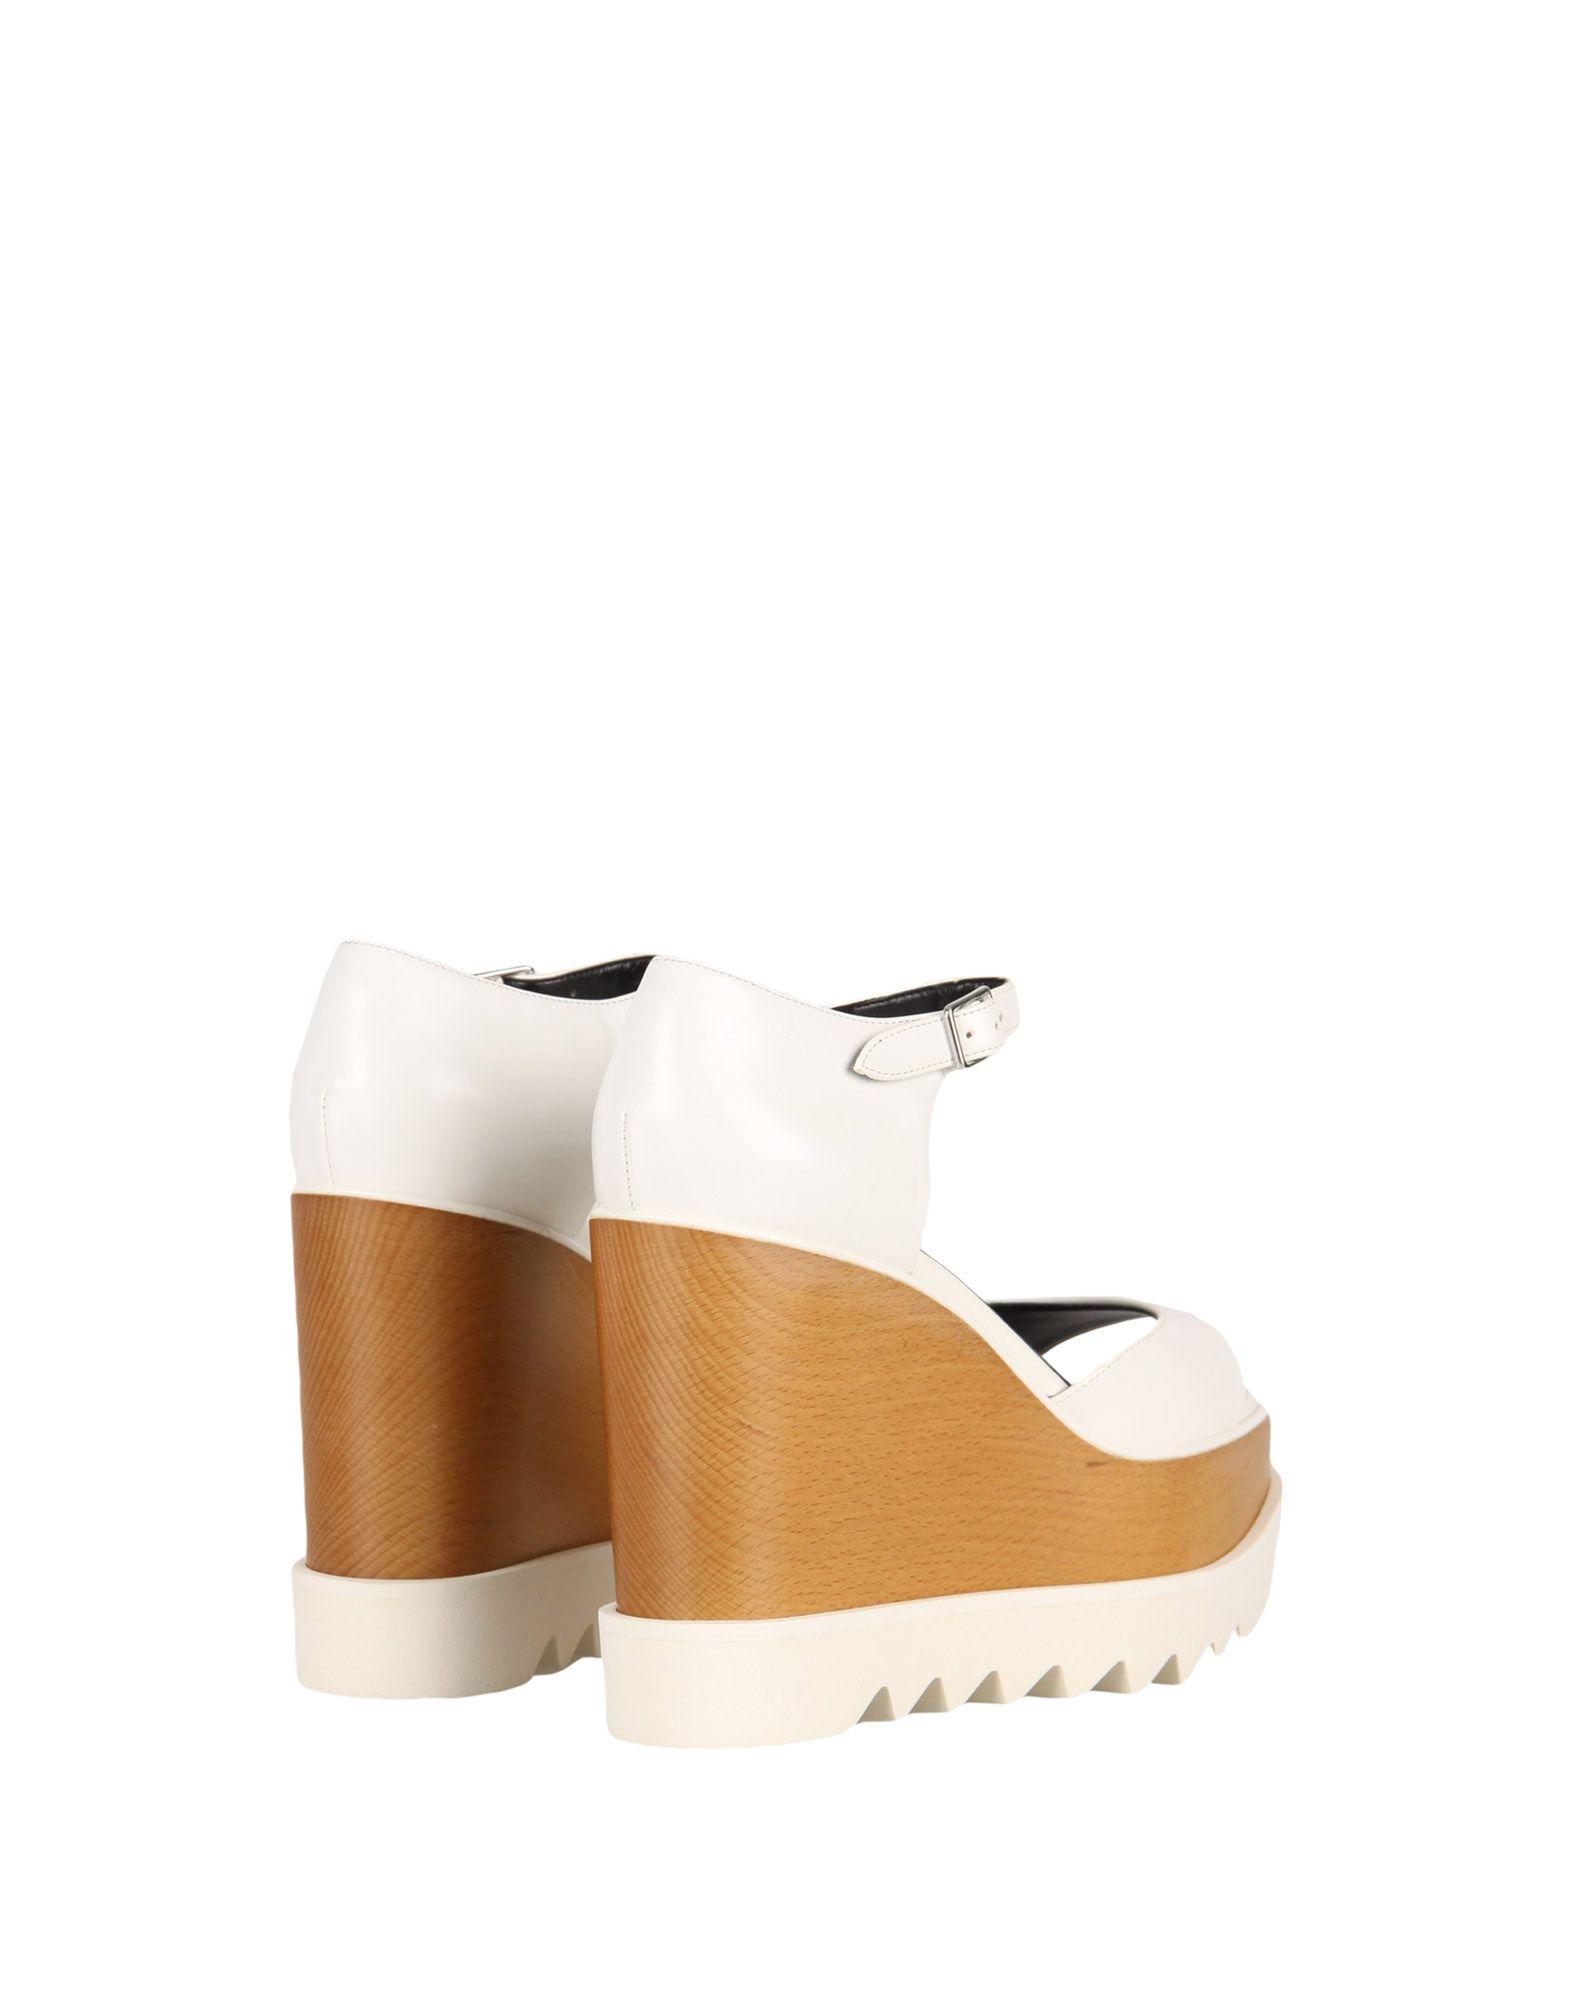 stella mccartney sandales sandales mccartney - femmes stella mccartney sandales en ligne sur canada ac47fc